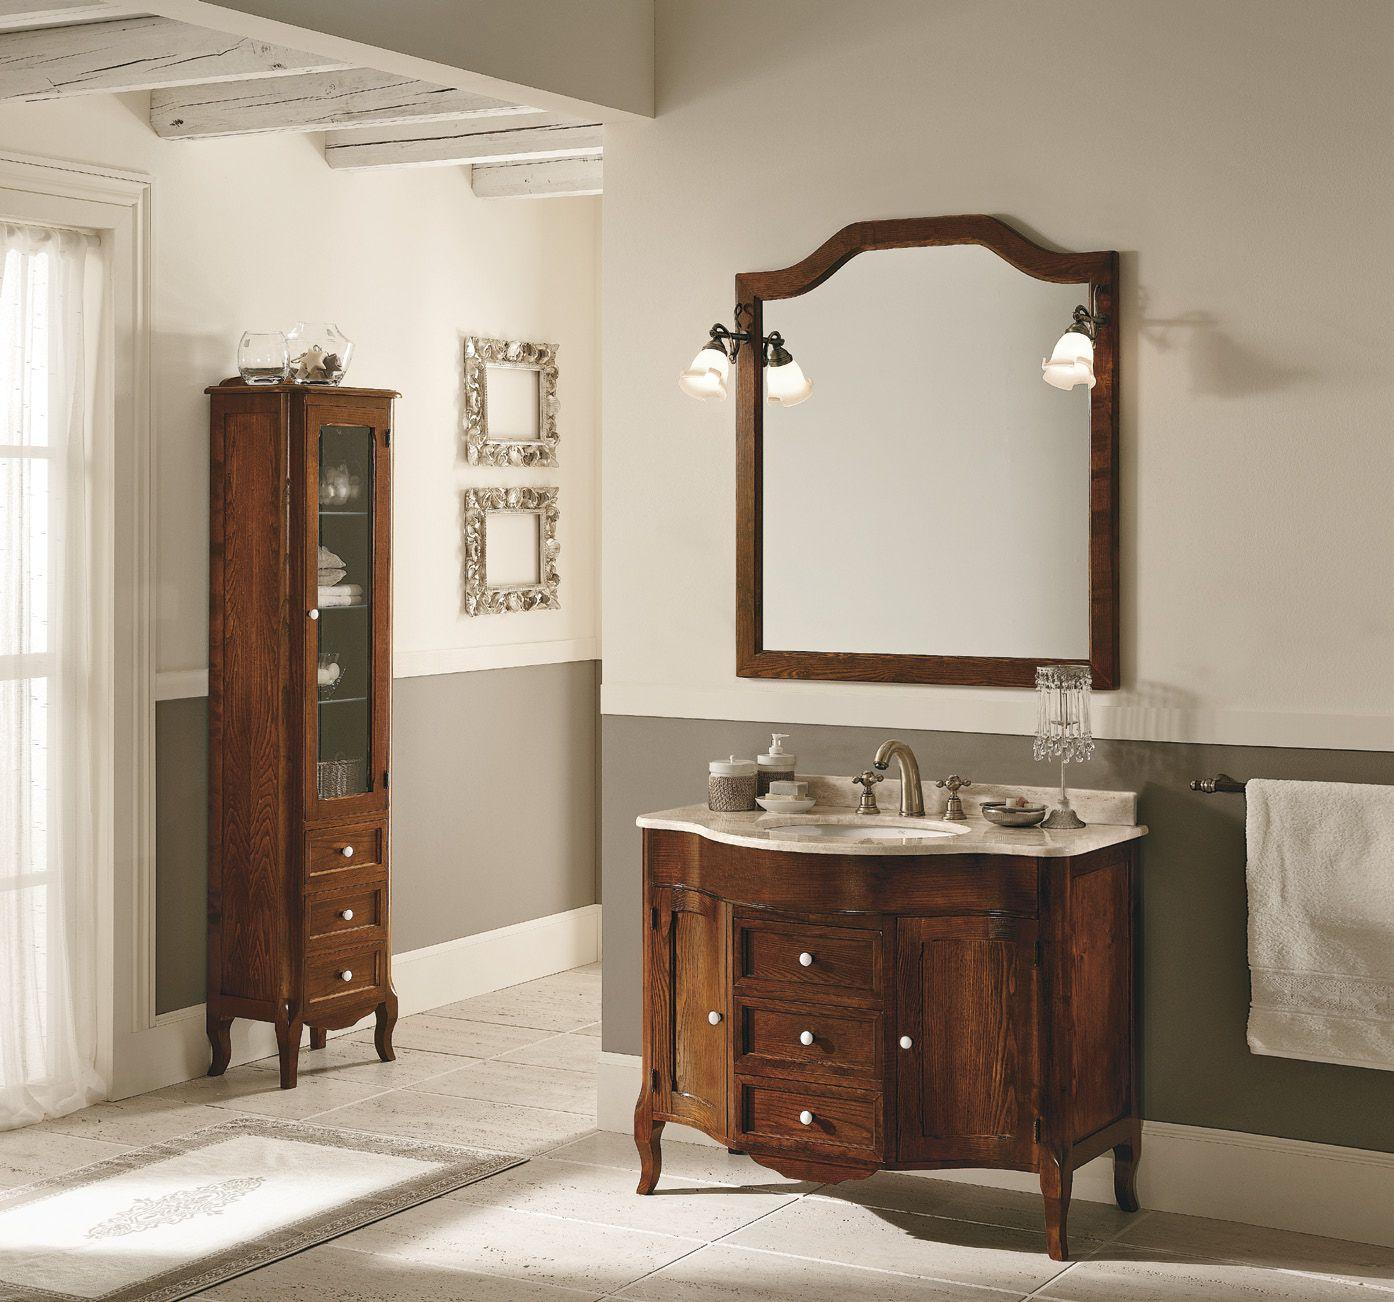 #Eban #composition Rebecca #166   on #bathroom39.com at 2101 Euro/set   #composition #bathroom #furniture #furnishings #design